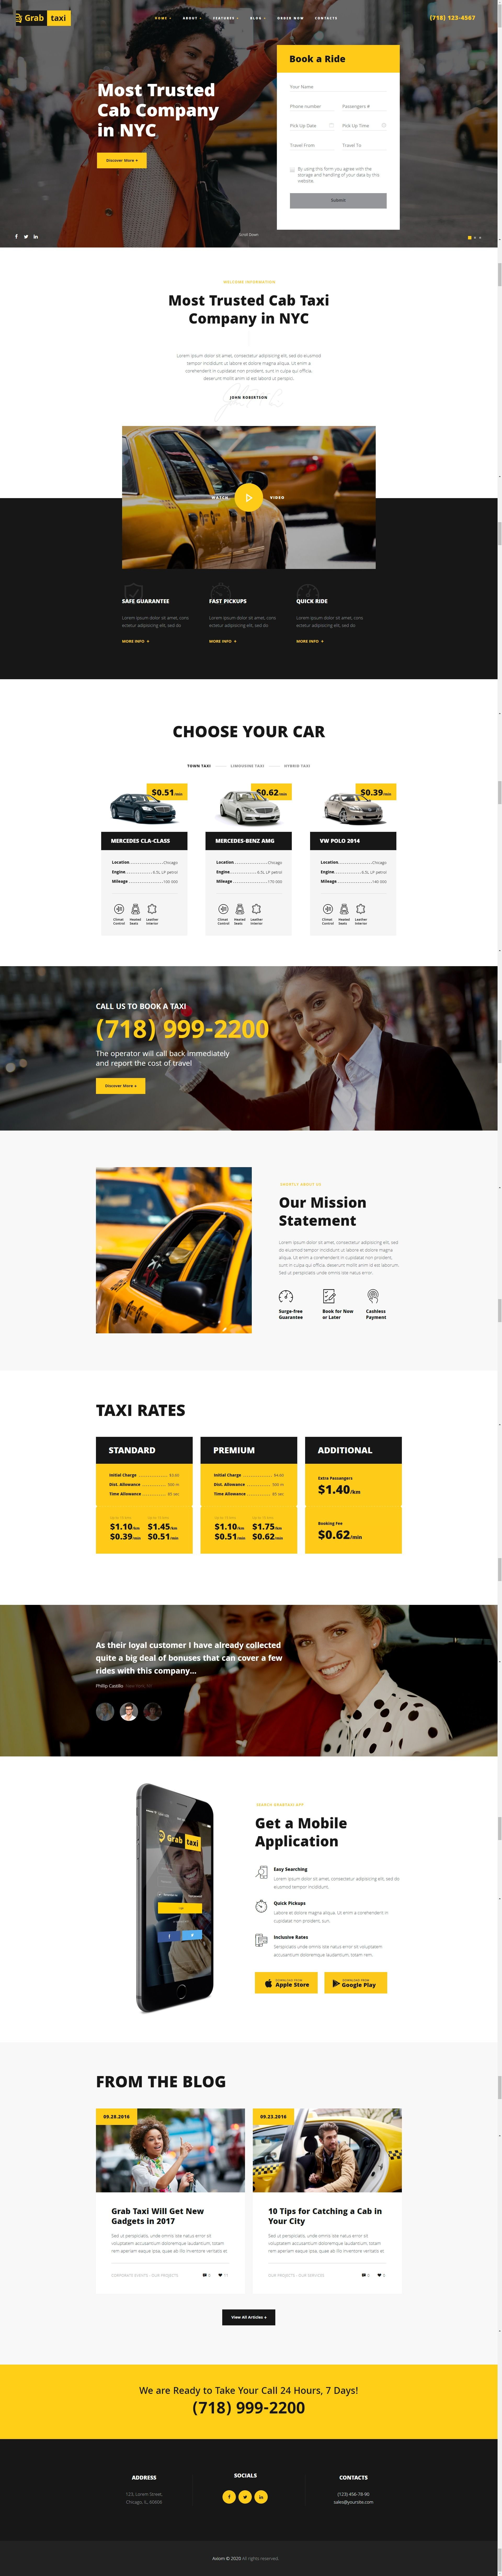 Grab taxi online taxi service wordpress theme stylelib